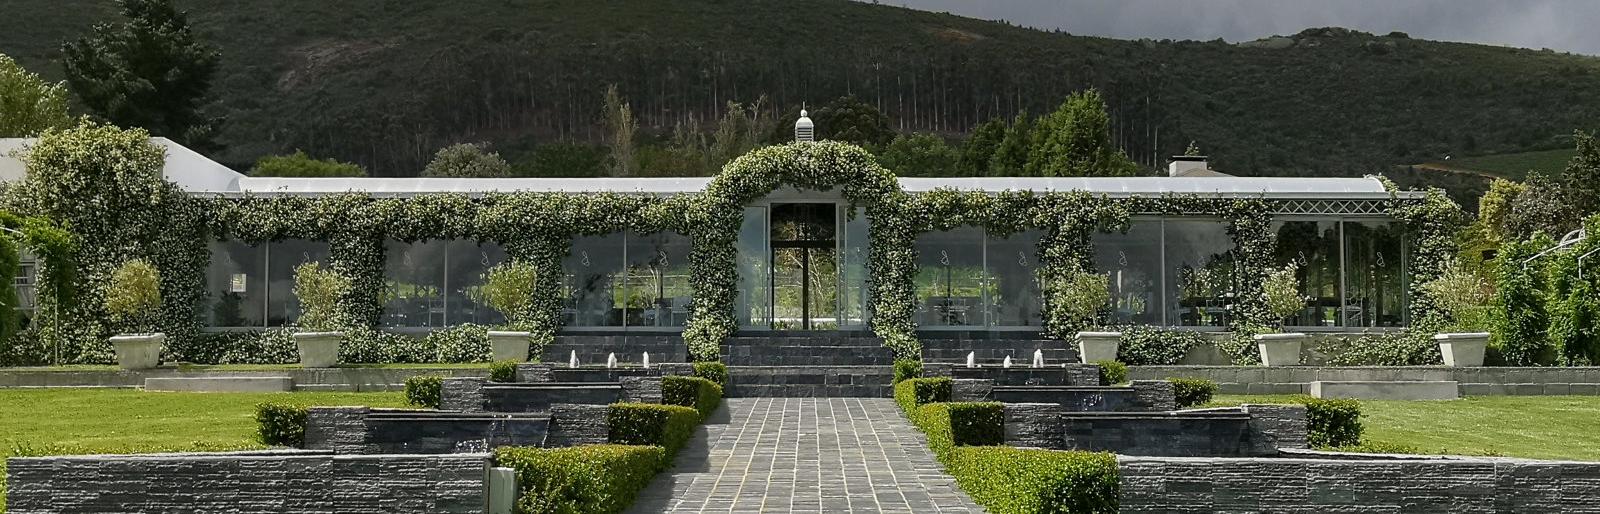 Belair Pavilion